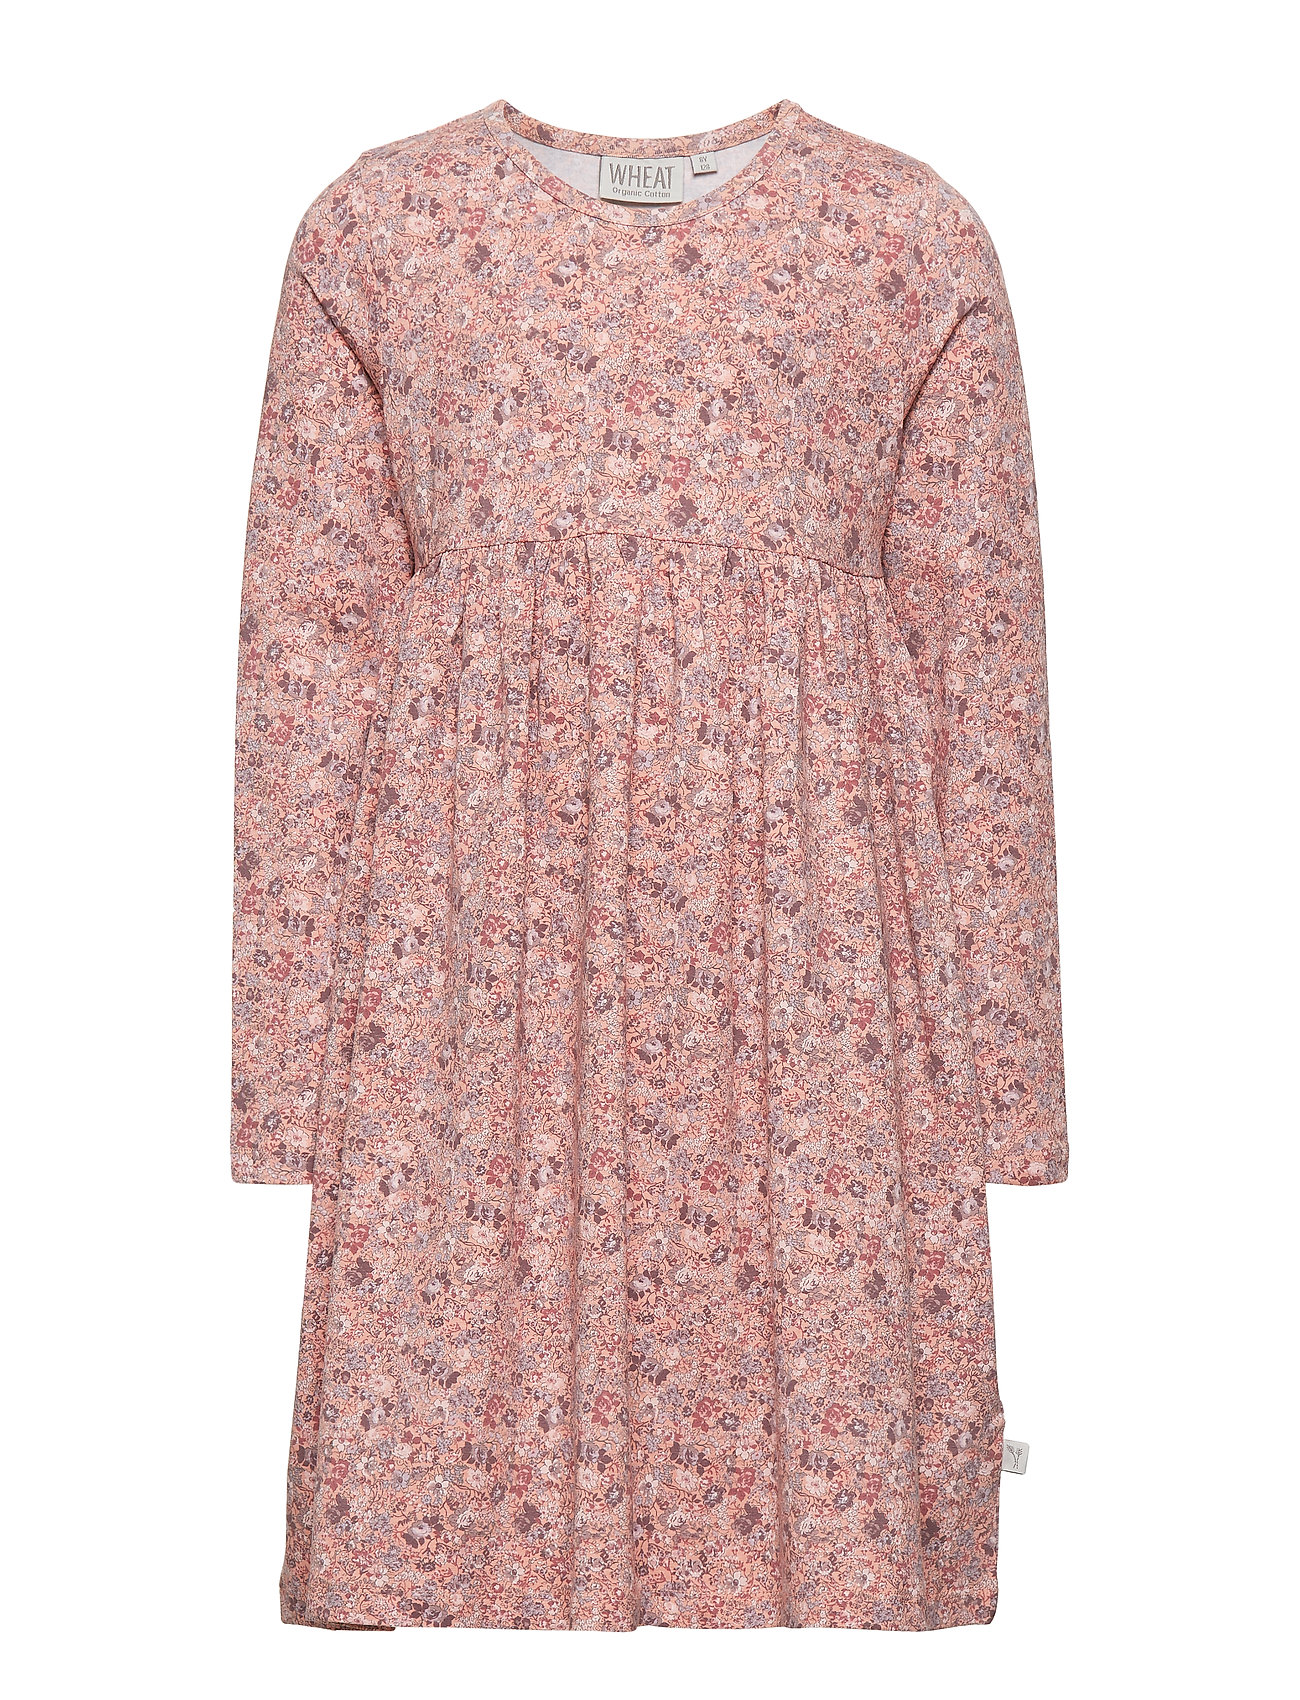 Wheat Dress Otilde - CAMEO BROWN